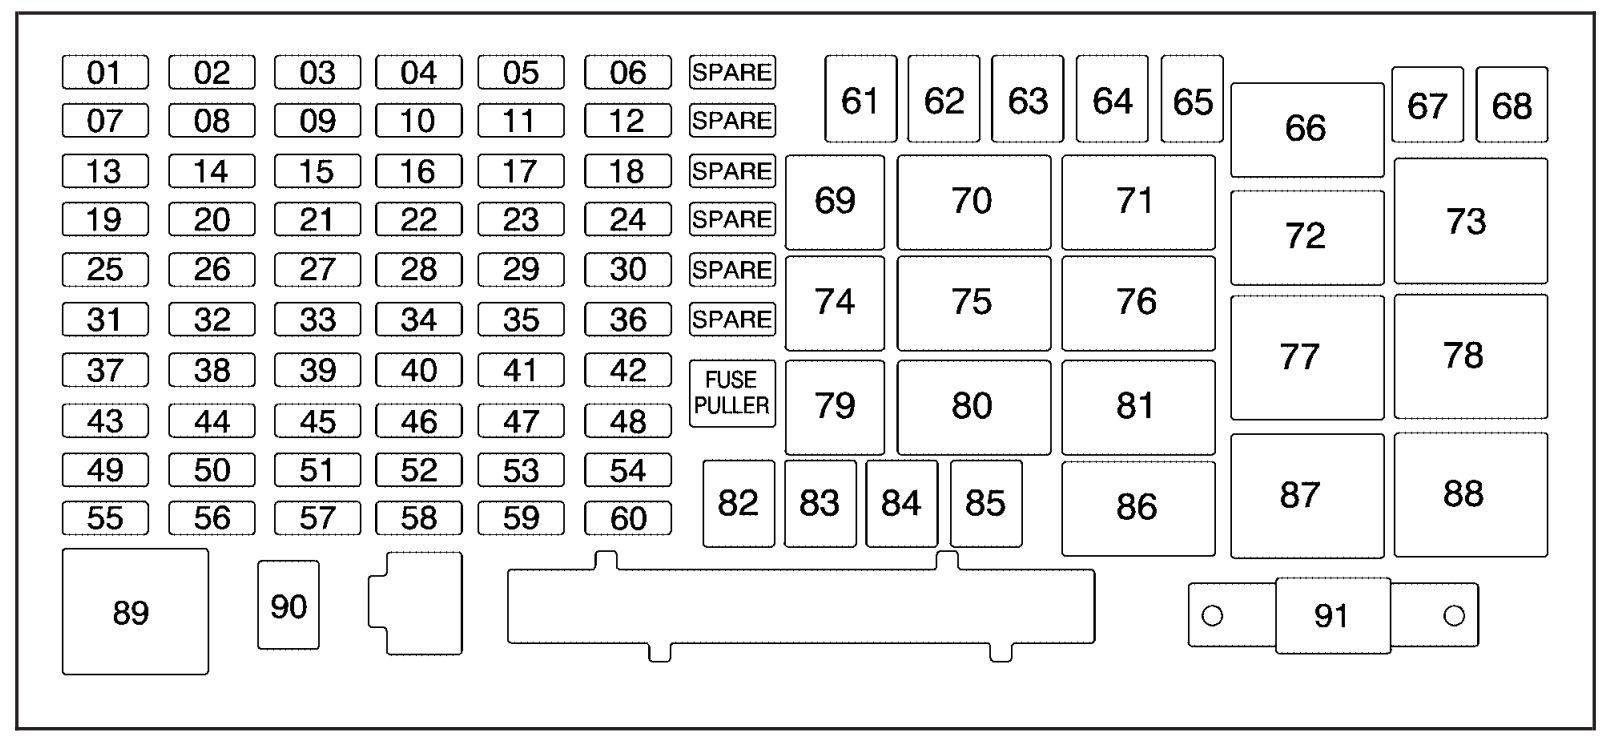 gmc h2 fuse box wiring diagram data val 1998 gmc 1500 fuse box gmc h2 fuse